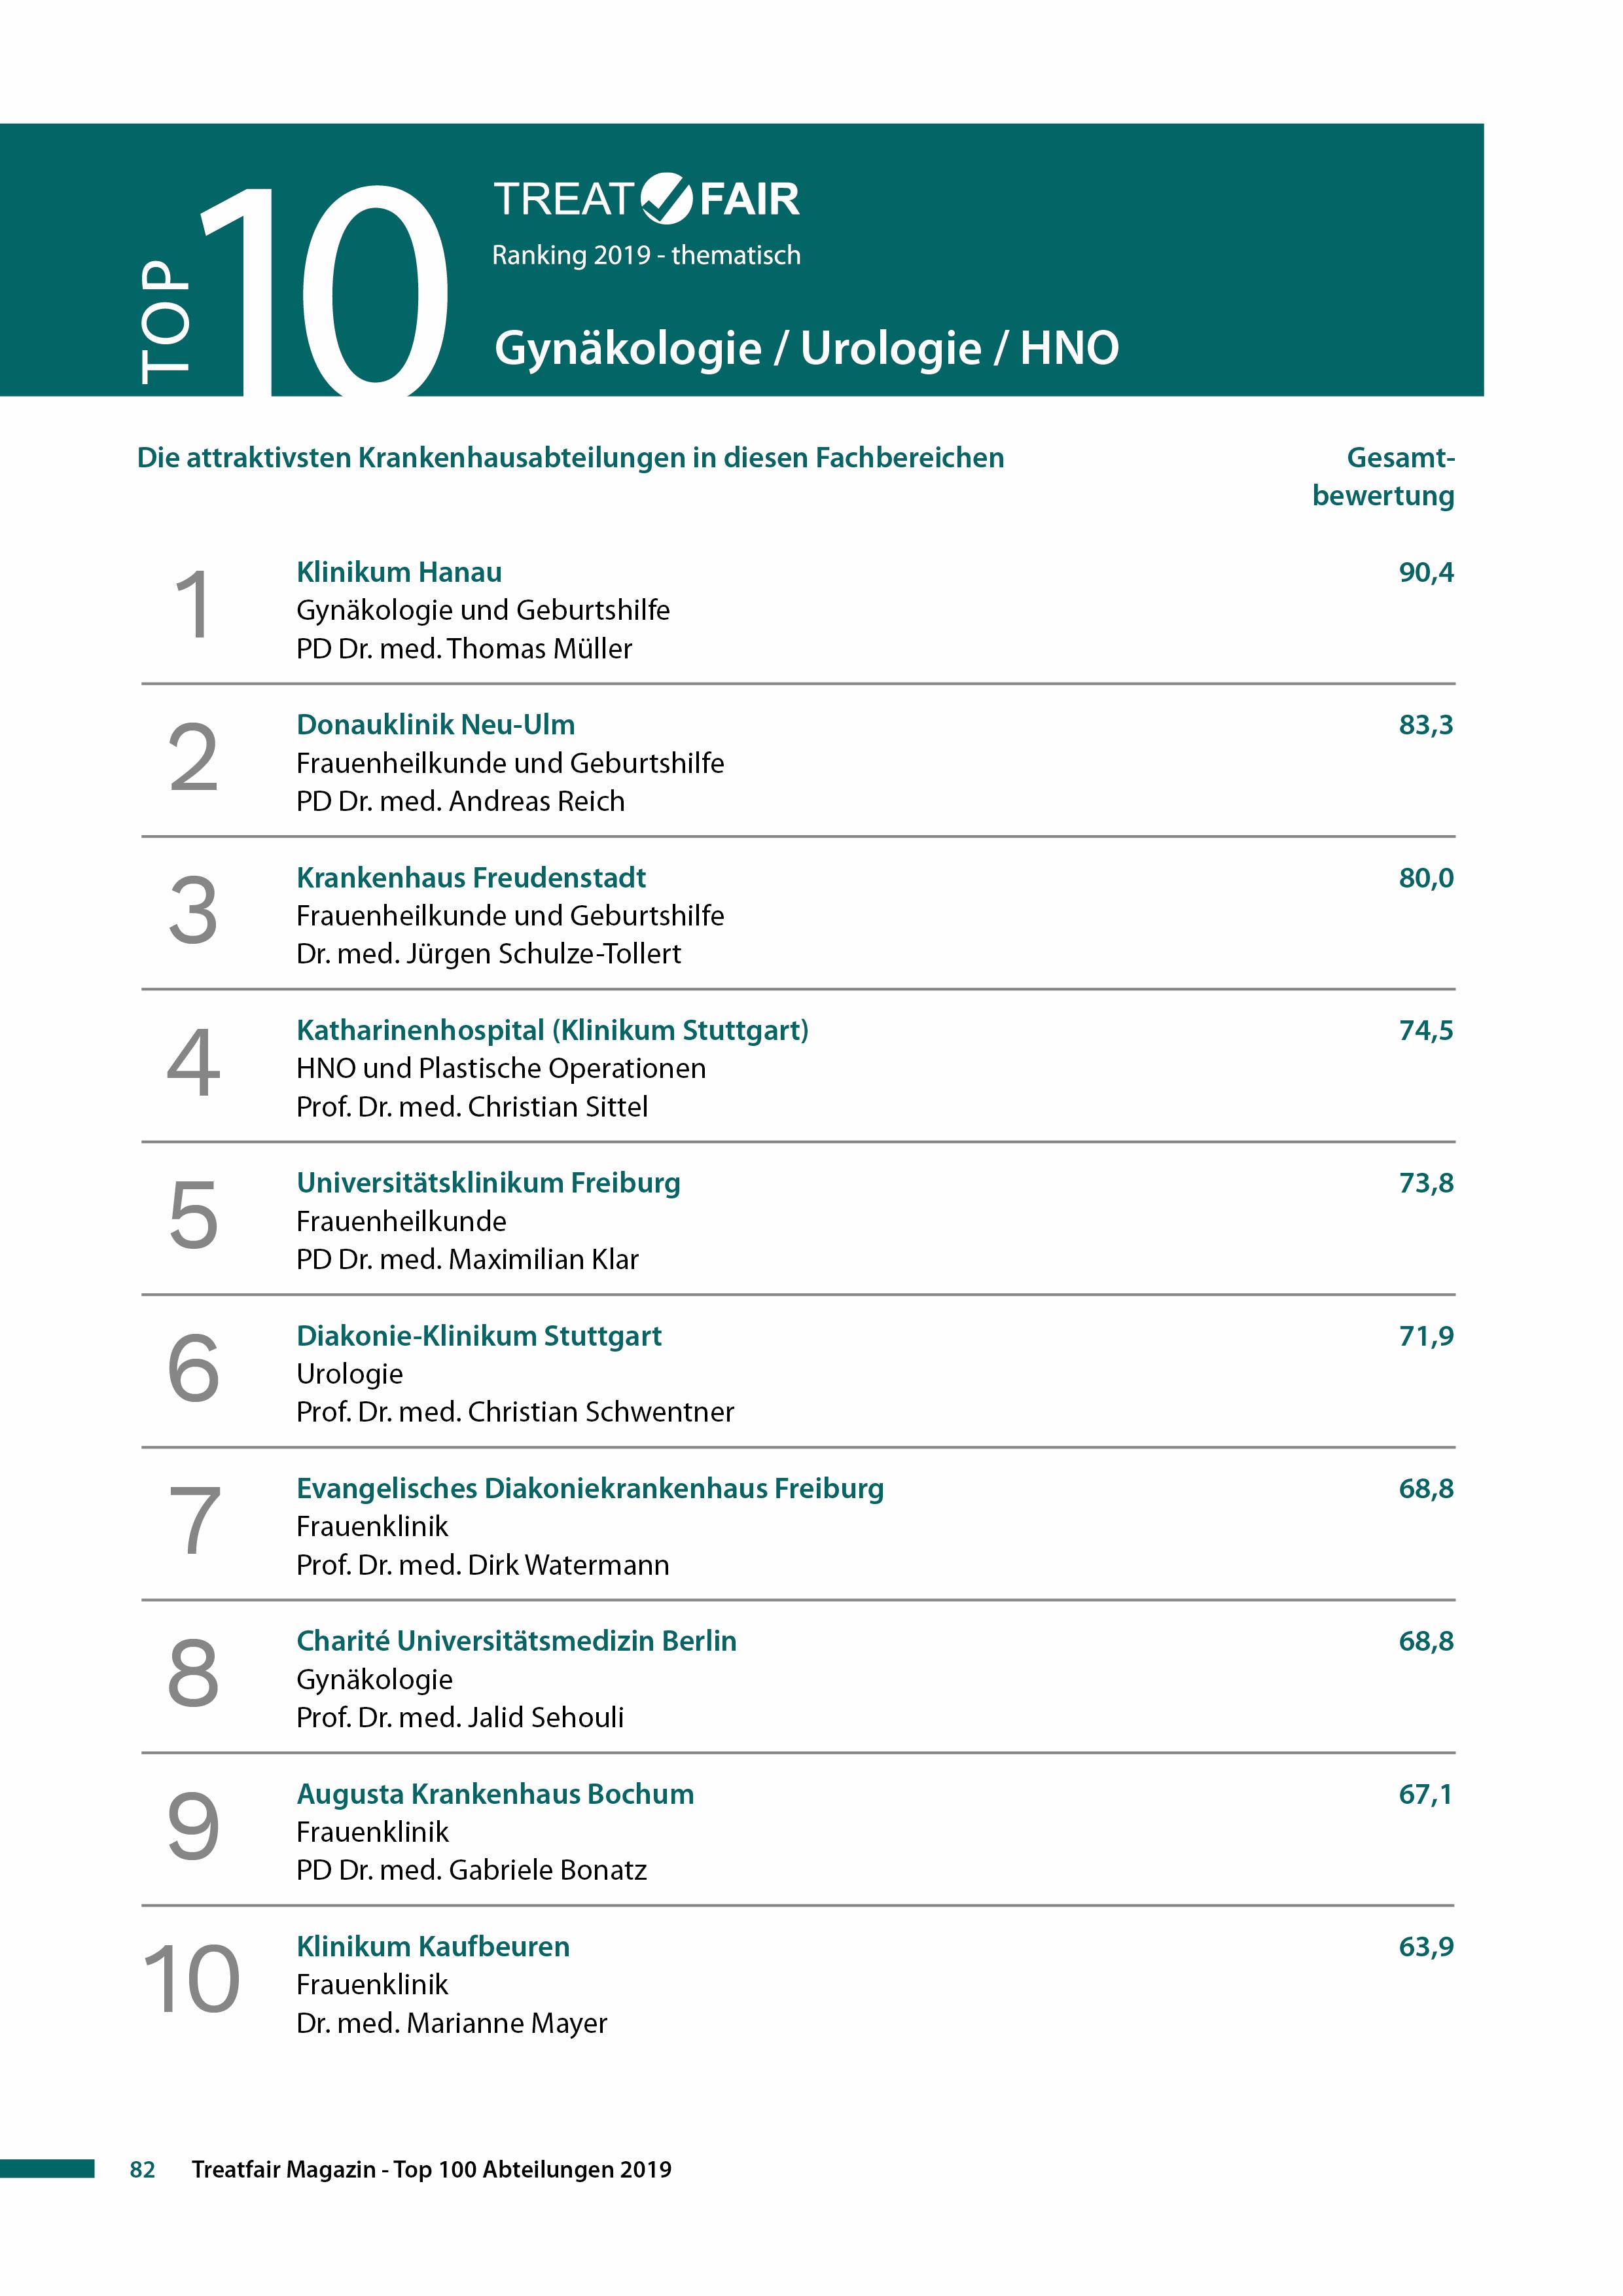 Treatfair Ranking Top 10 Gyn Uro HNO.jpg